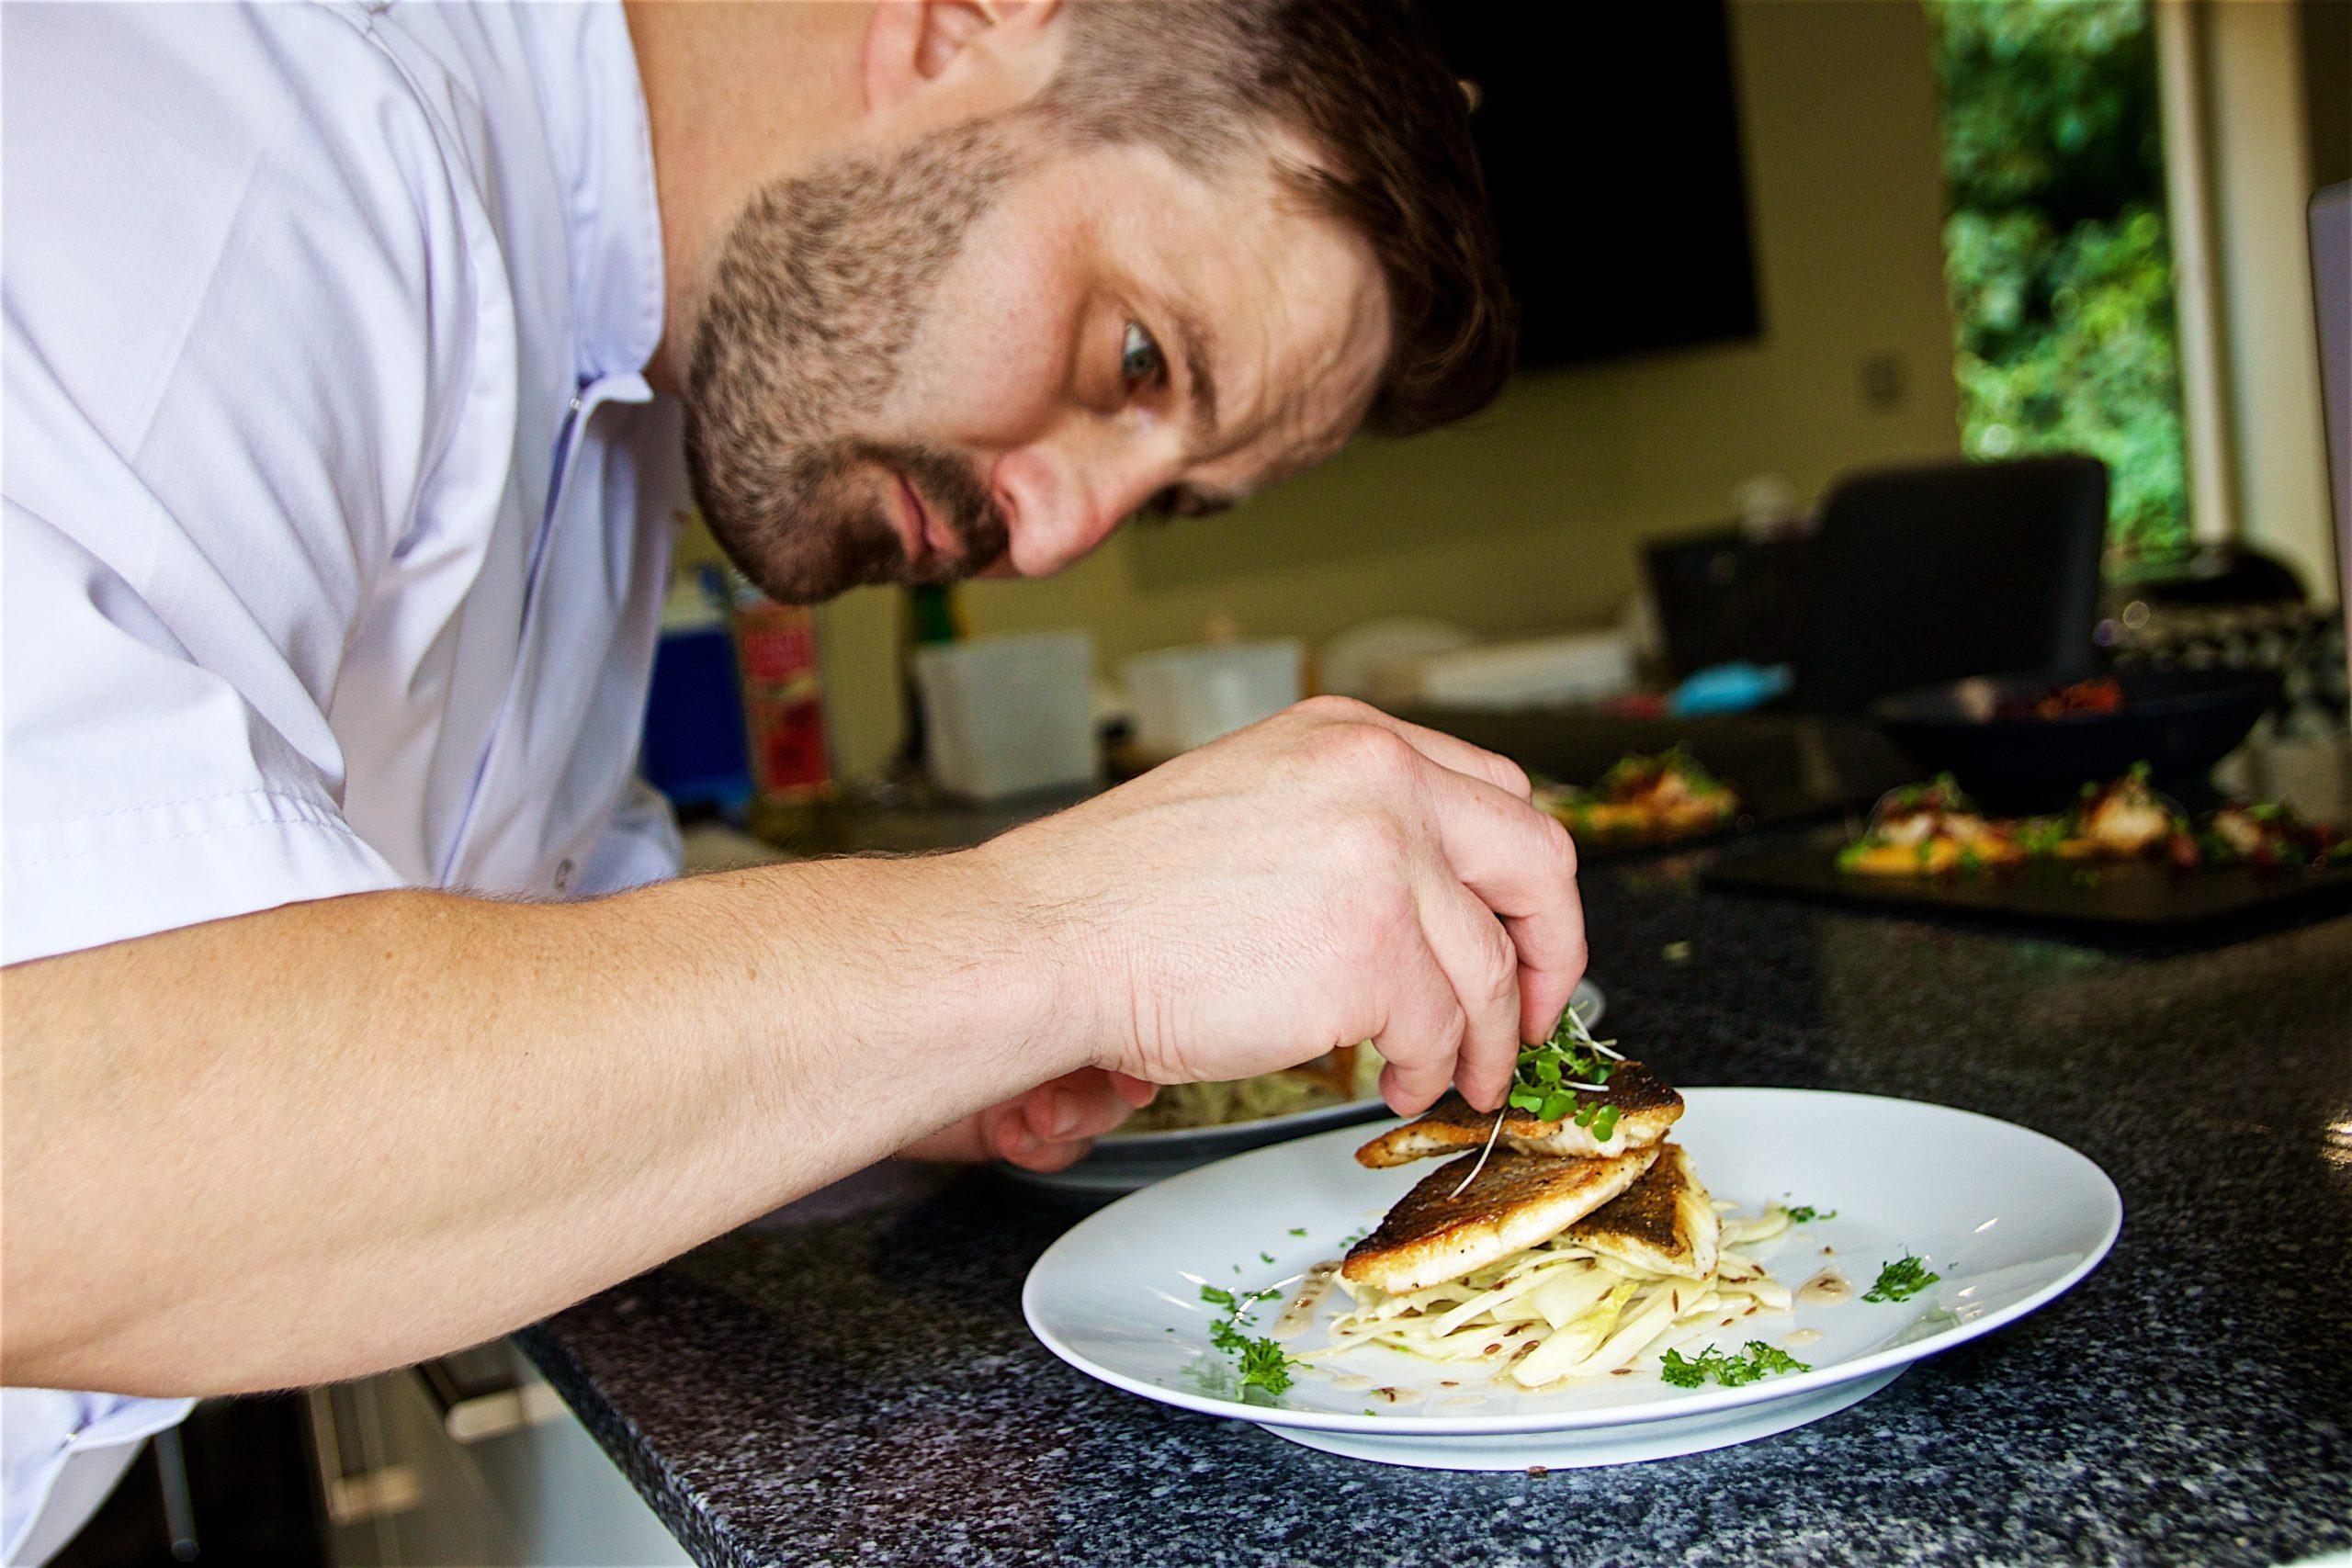 Bramble Dining, fine dining, Richard Bramble, chef